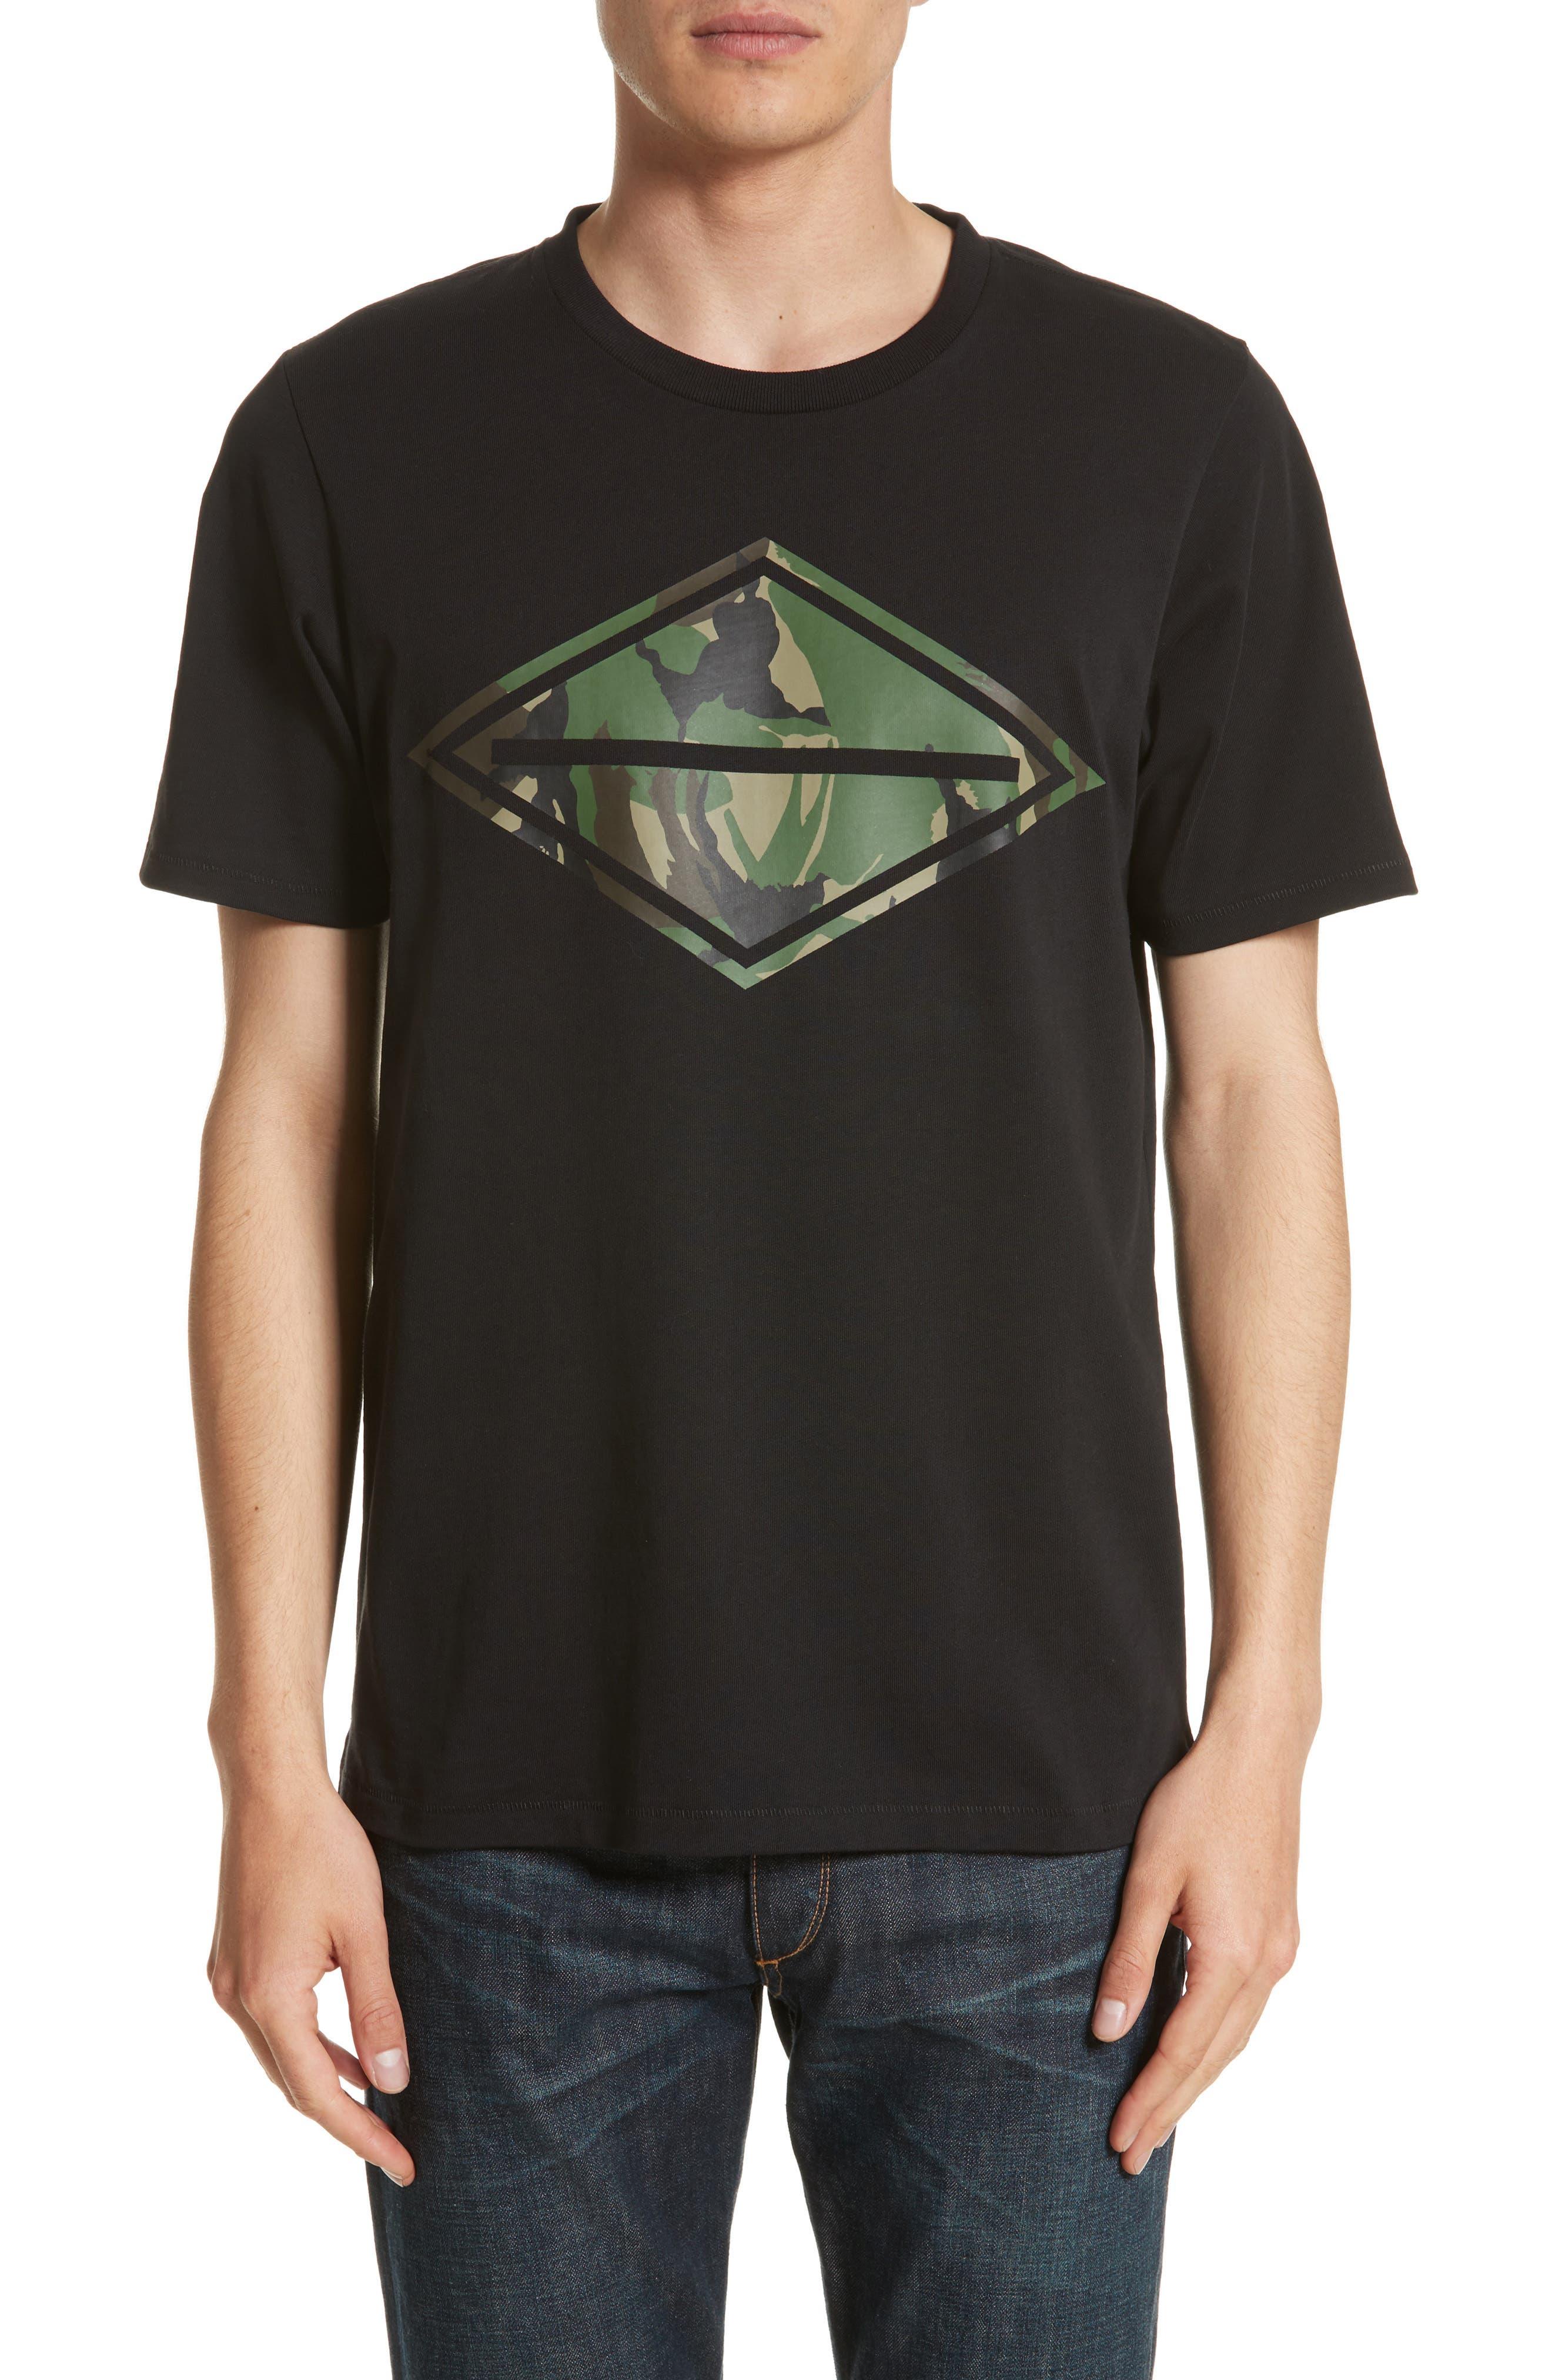 Main Image - rag & bone Camo Diamond Graphic T-Shirt